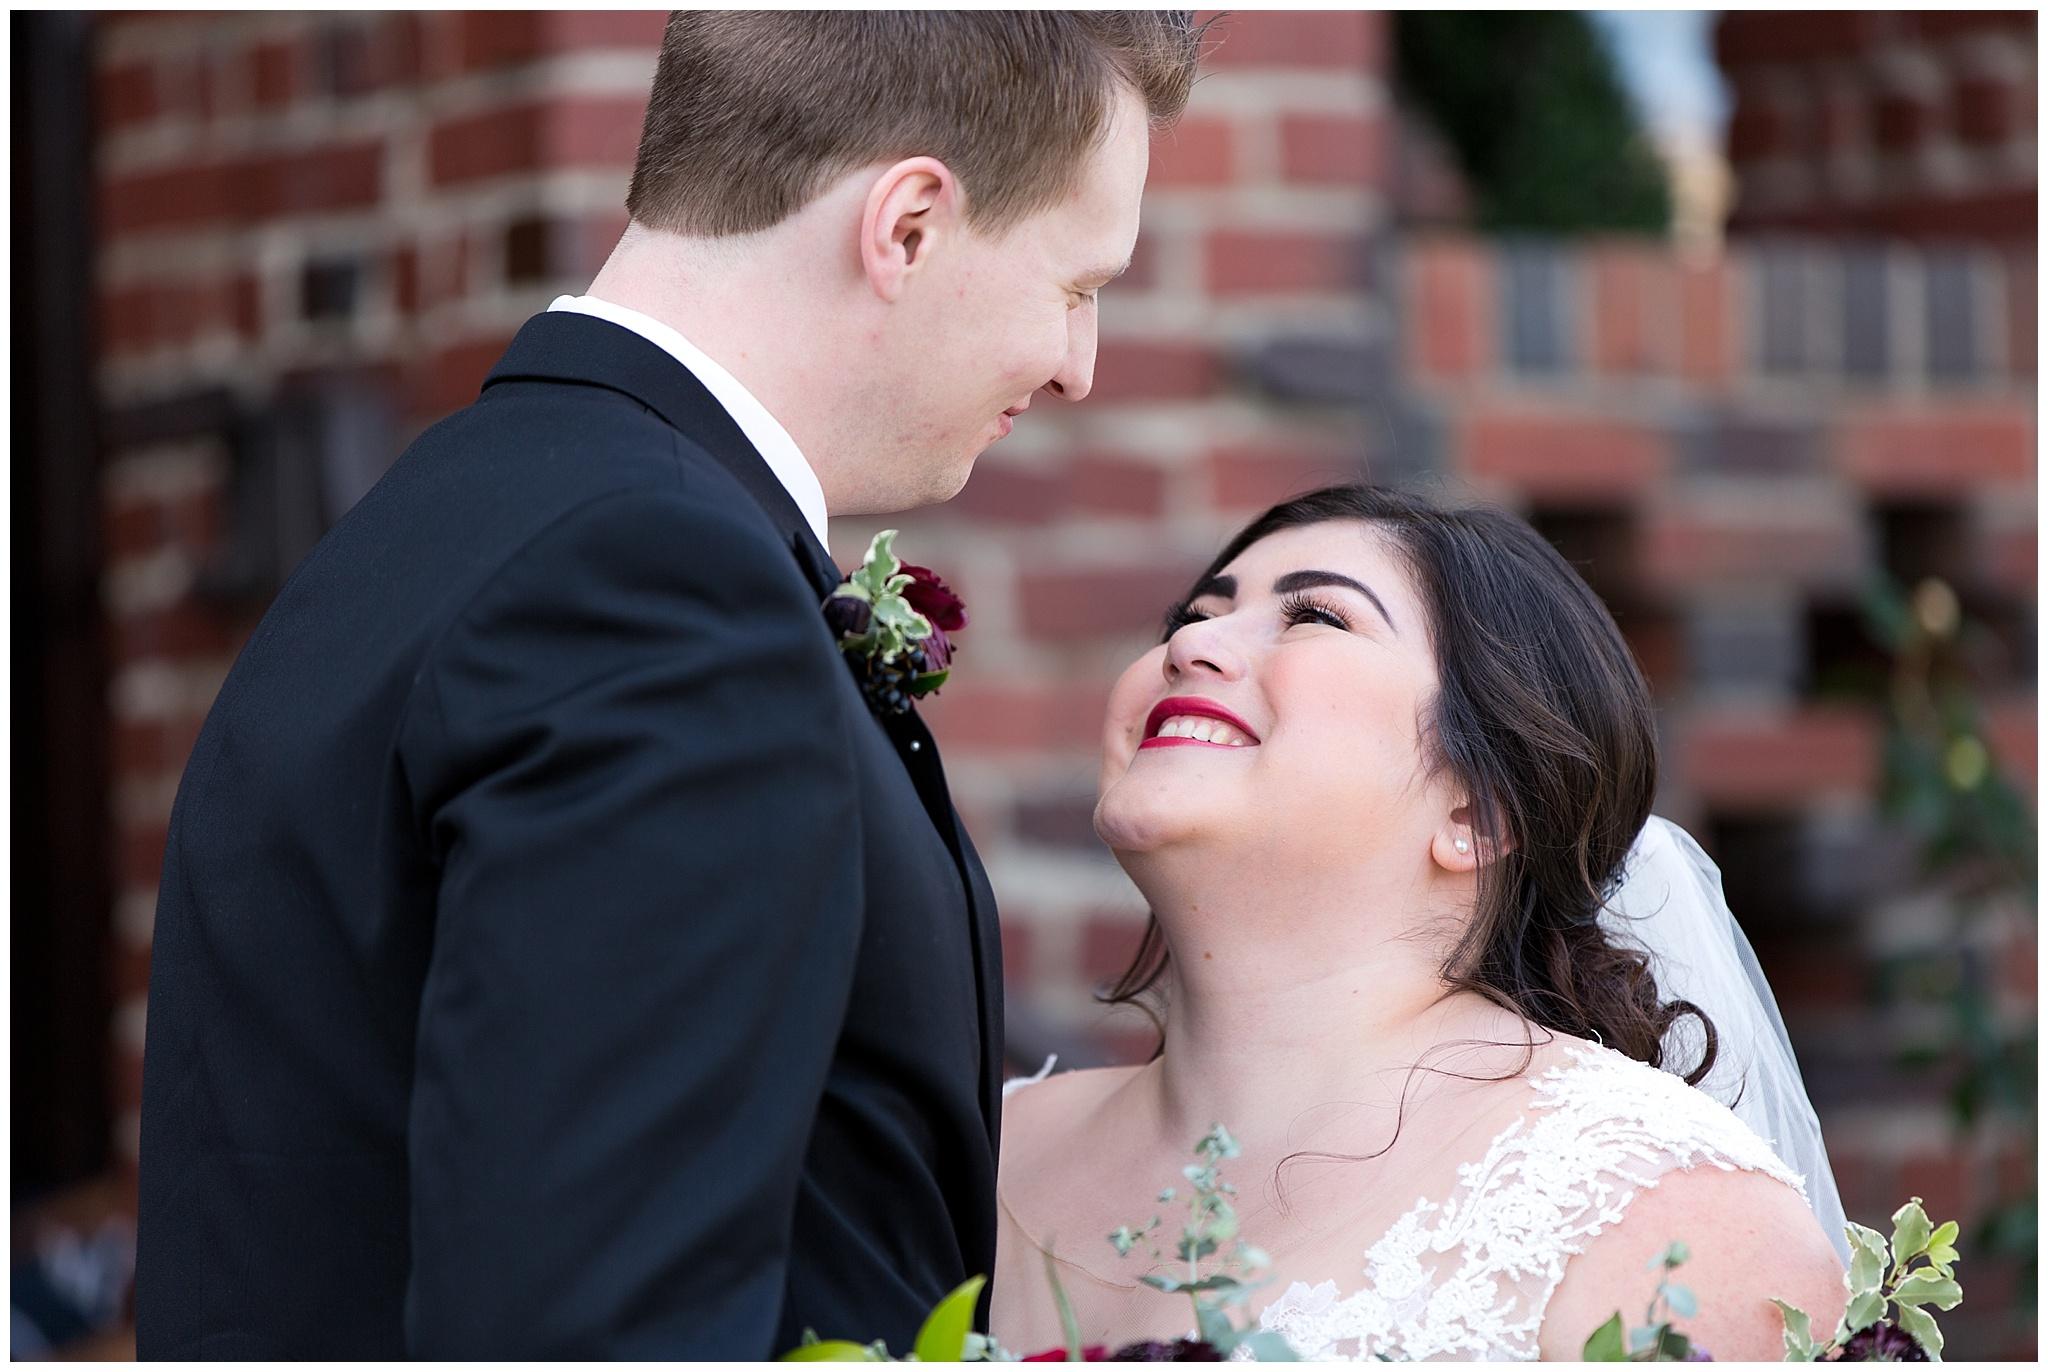 Carol_and_Grant_Wedding_3-3-18-7808.jpg